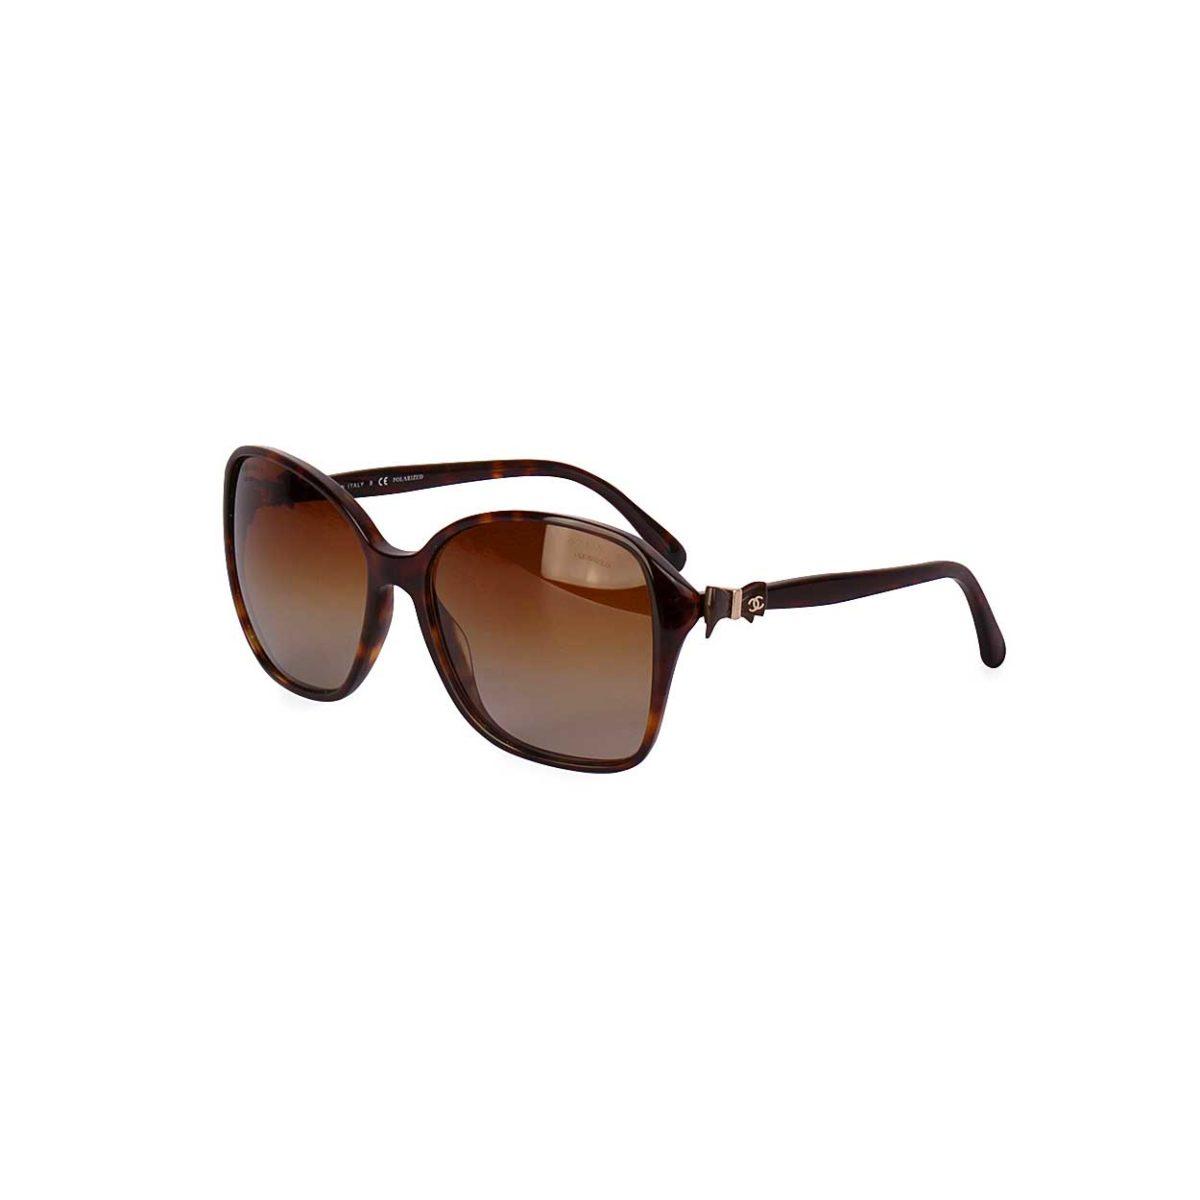 CHANEL Tortoise CC Bow Sunglasses 5205 - Luxity